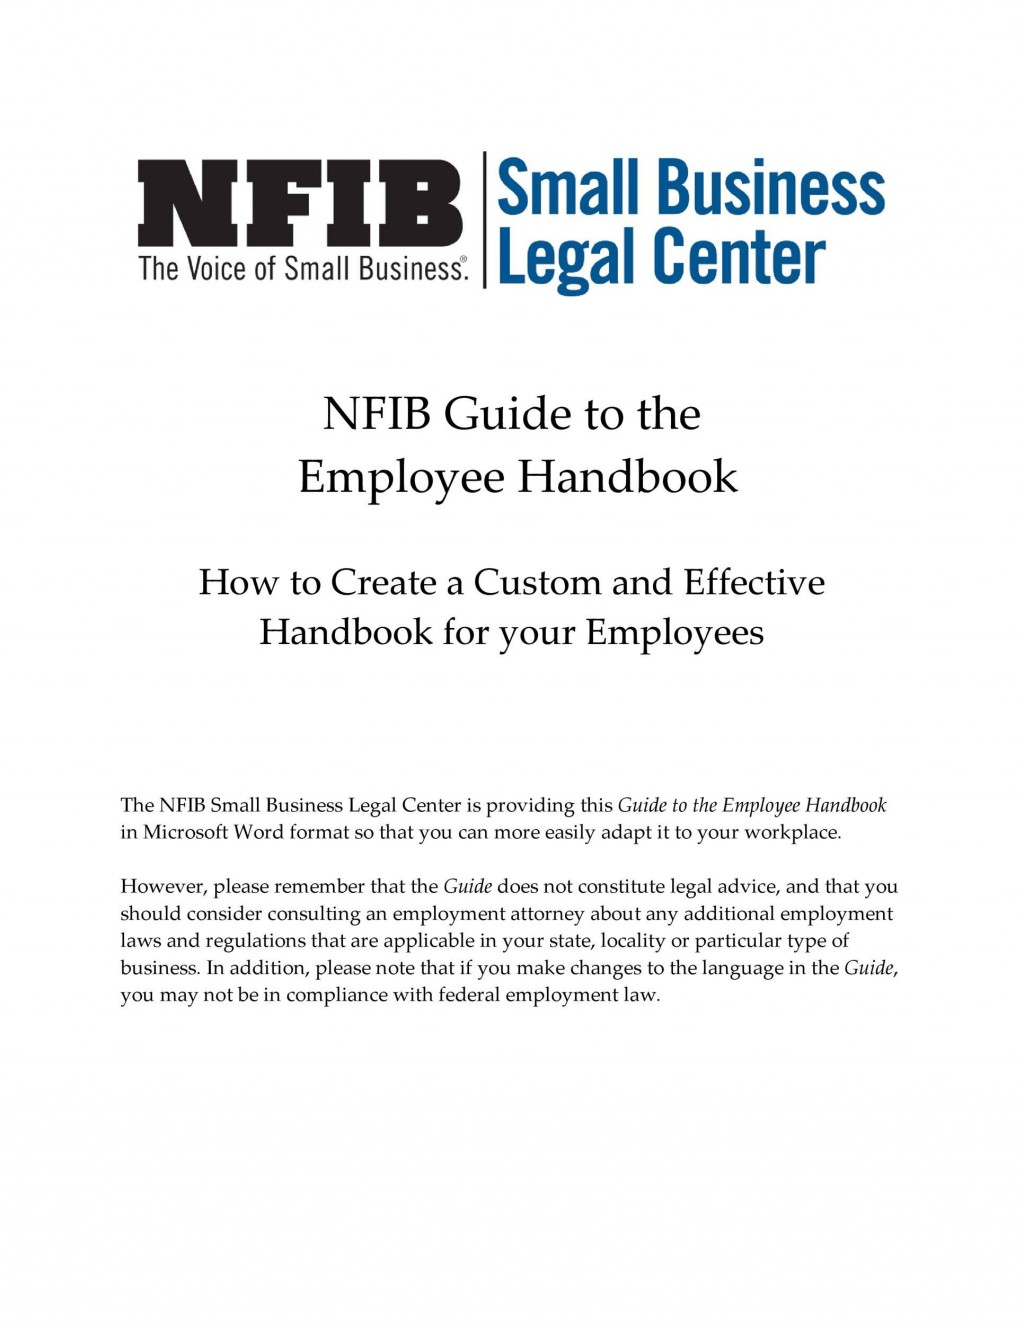 004 Outstanding Free Employee Handbook Template Word High Resolution  Sample In Training ManualLarge